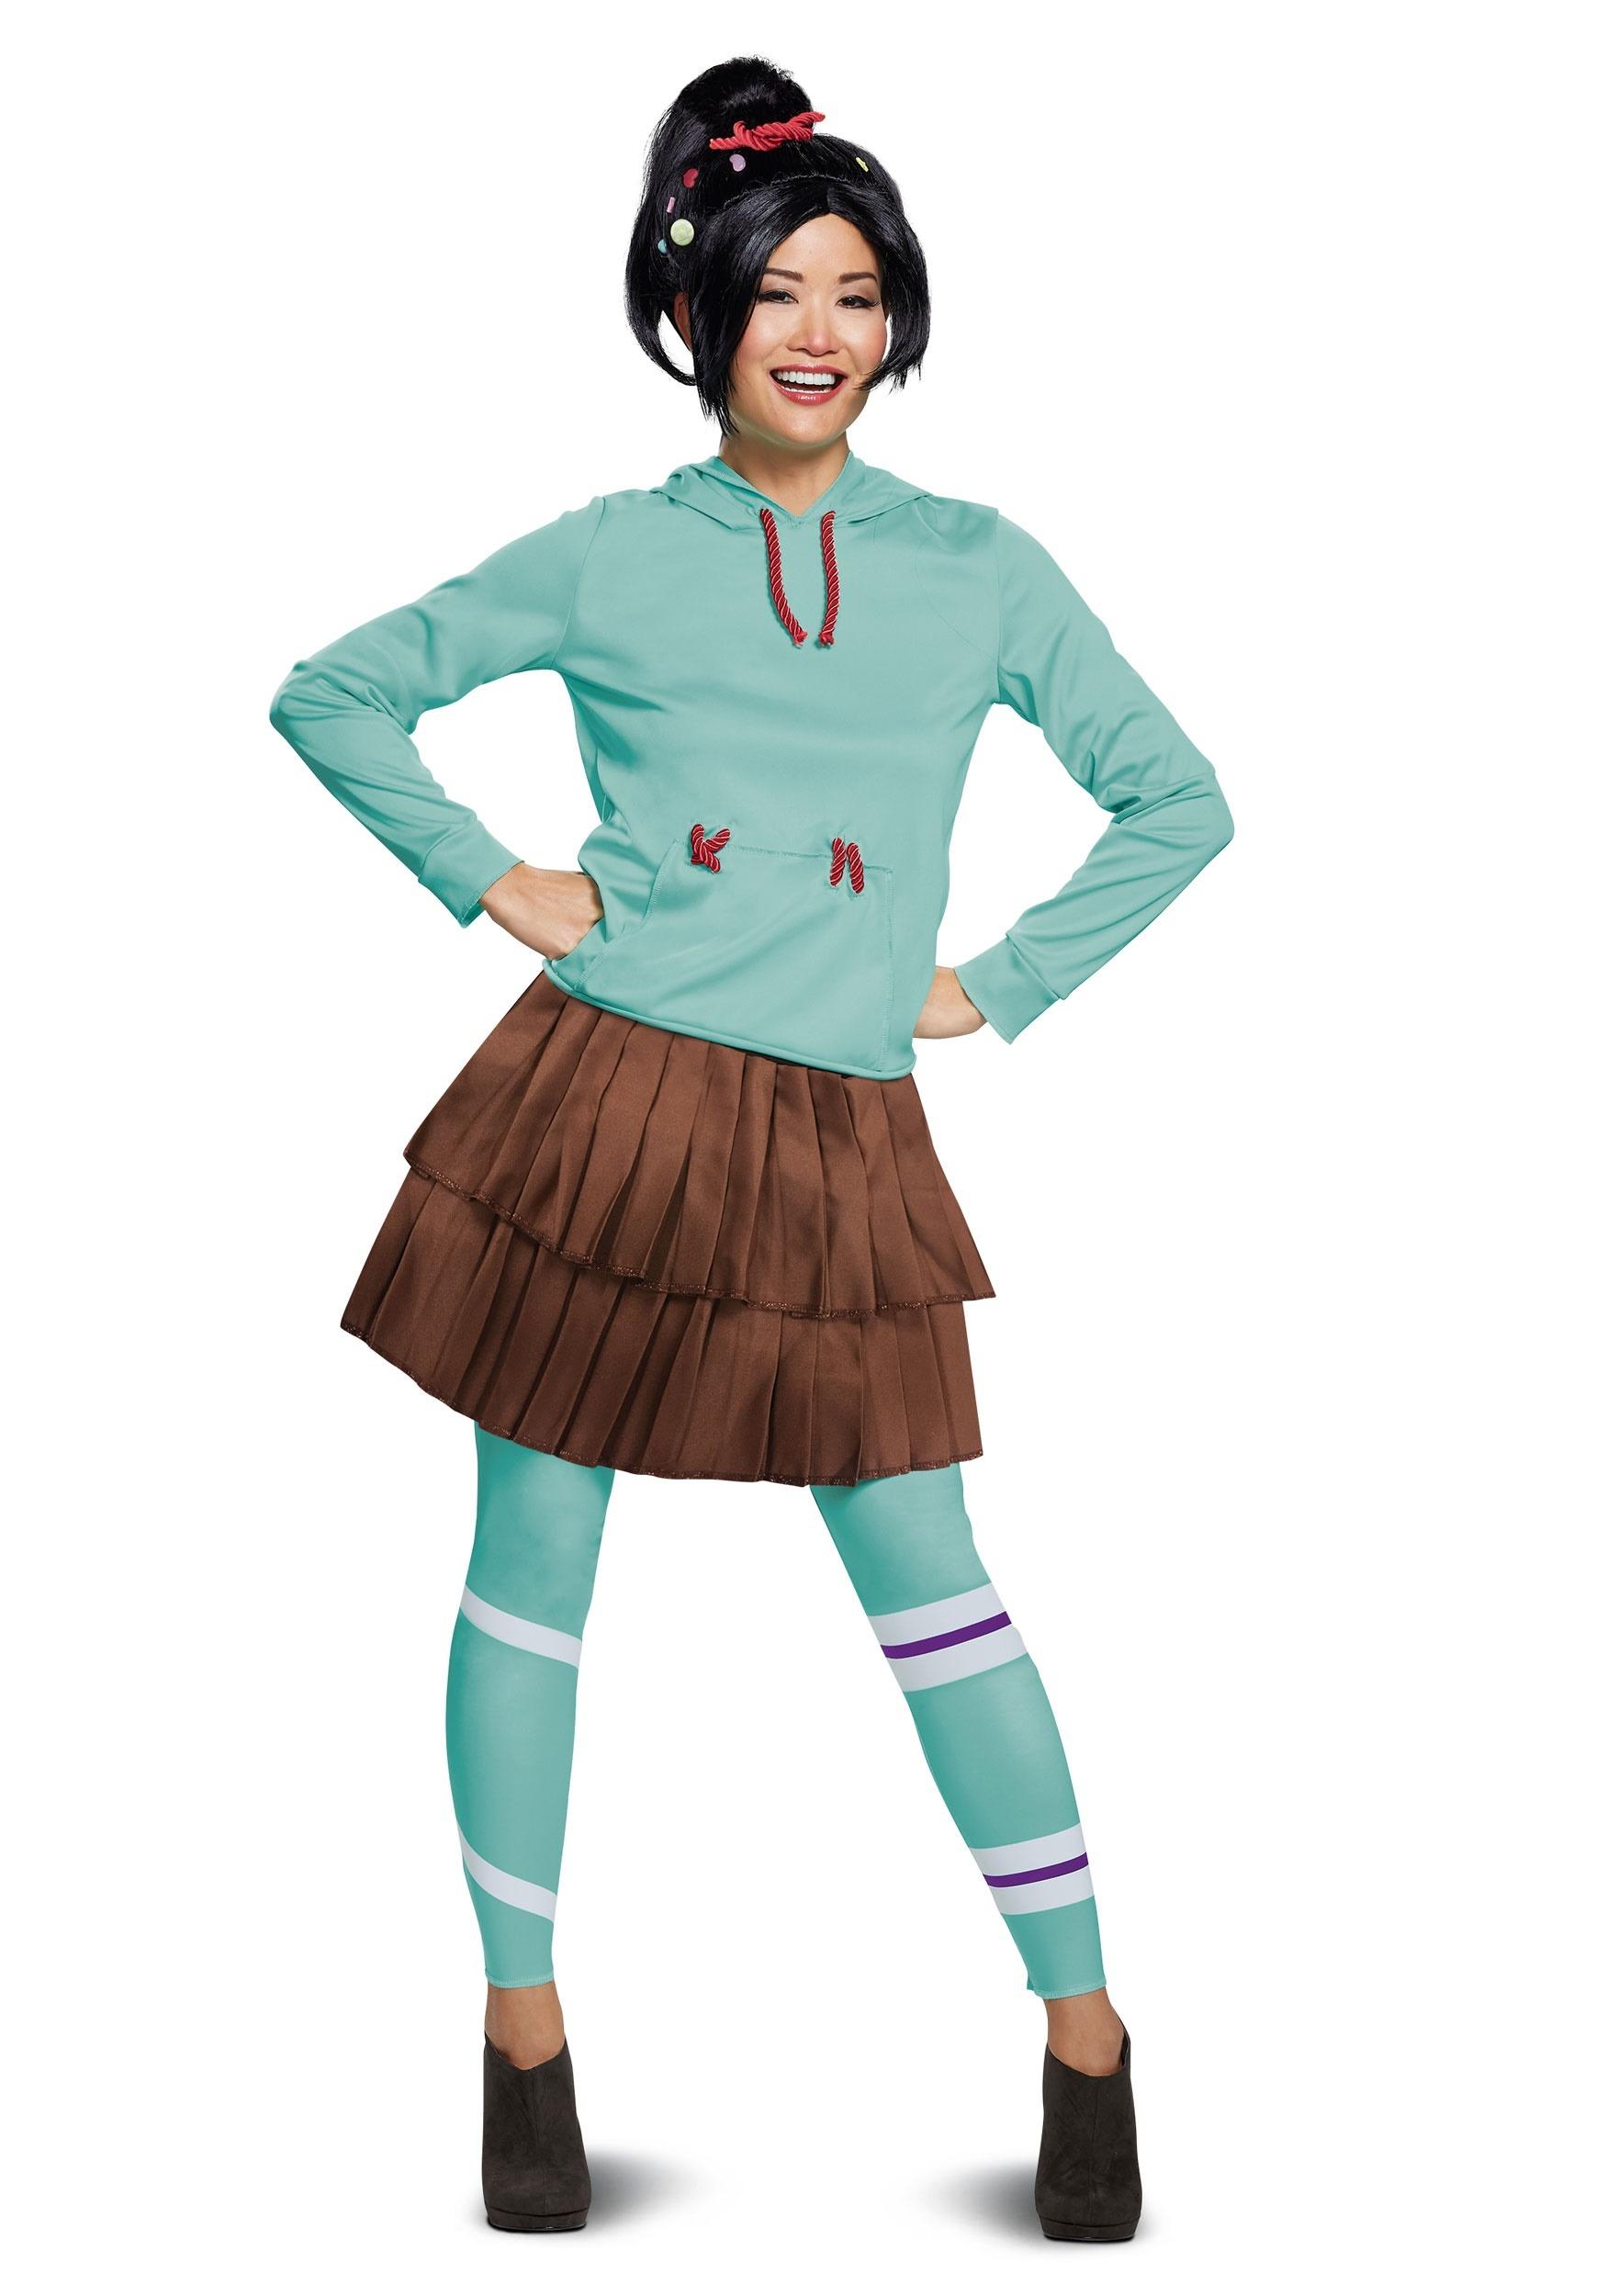 Wreck It Ralph 2 Deluxe Vanellope Costume for Women